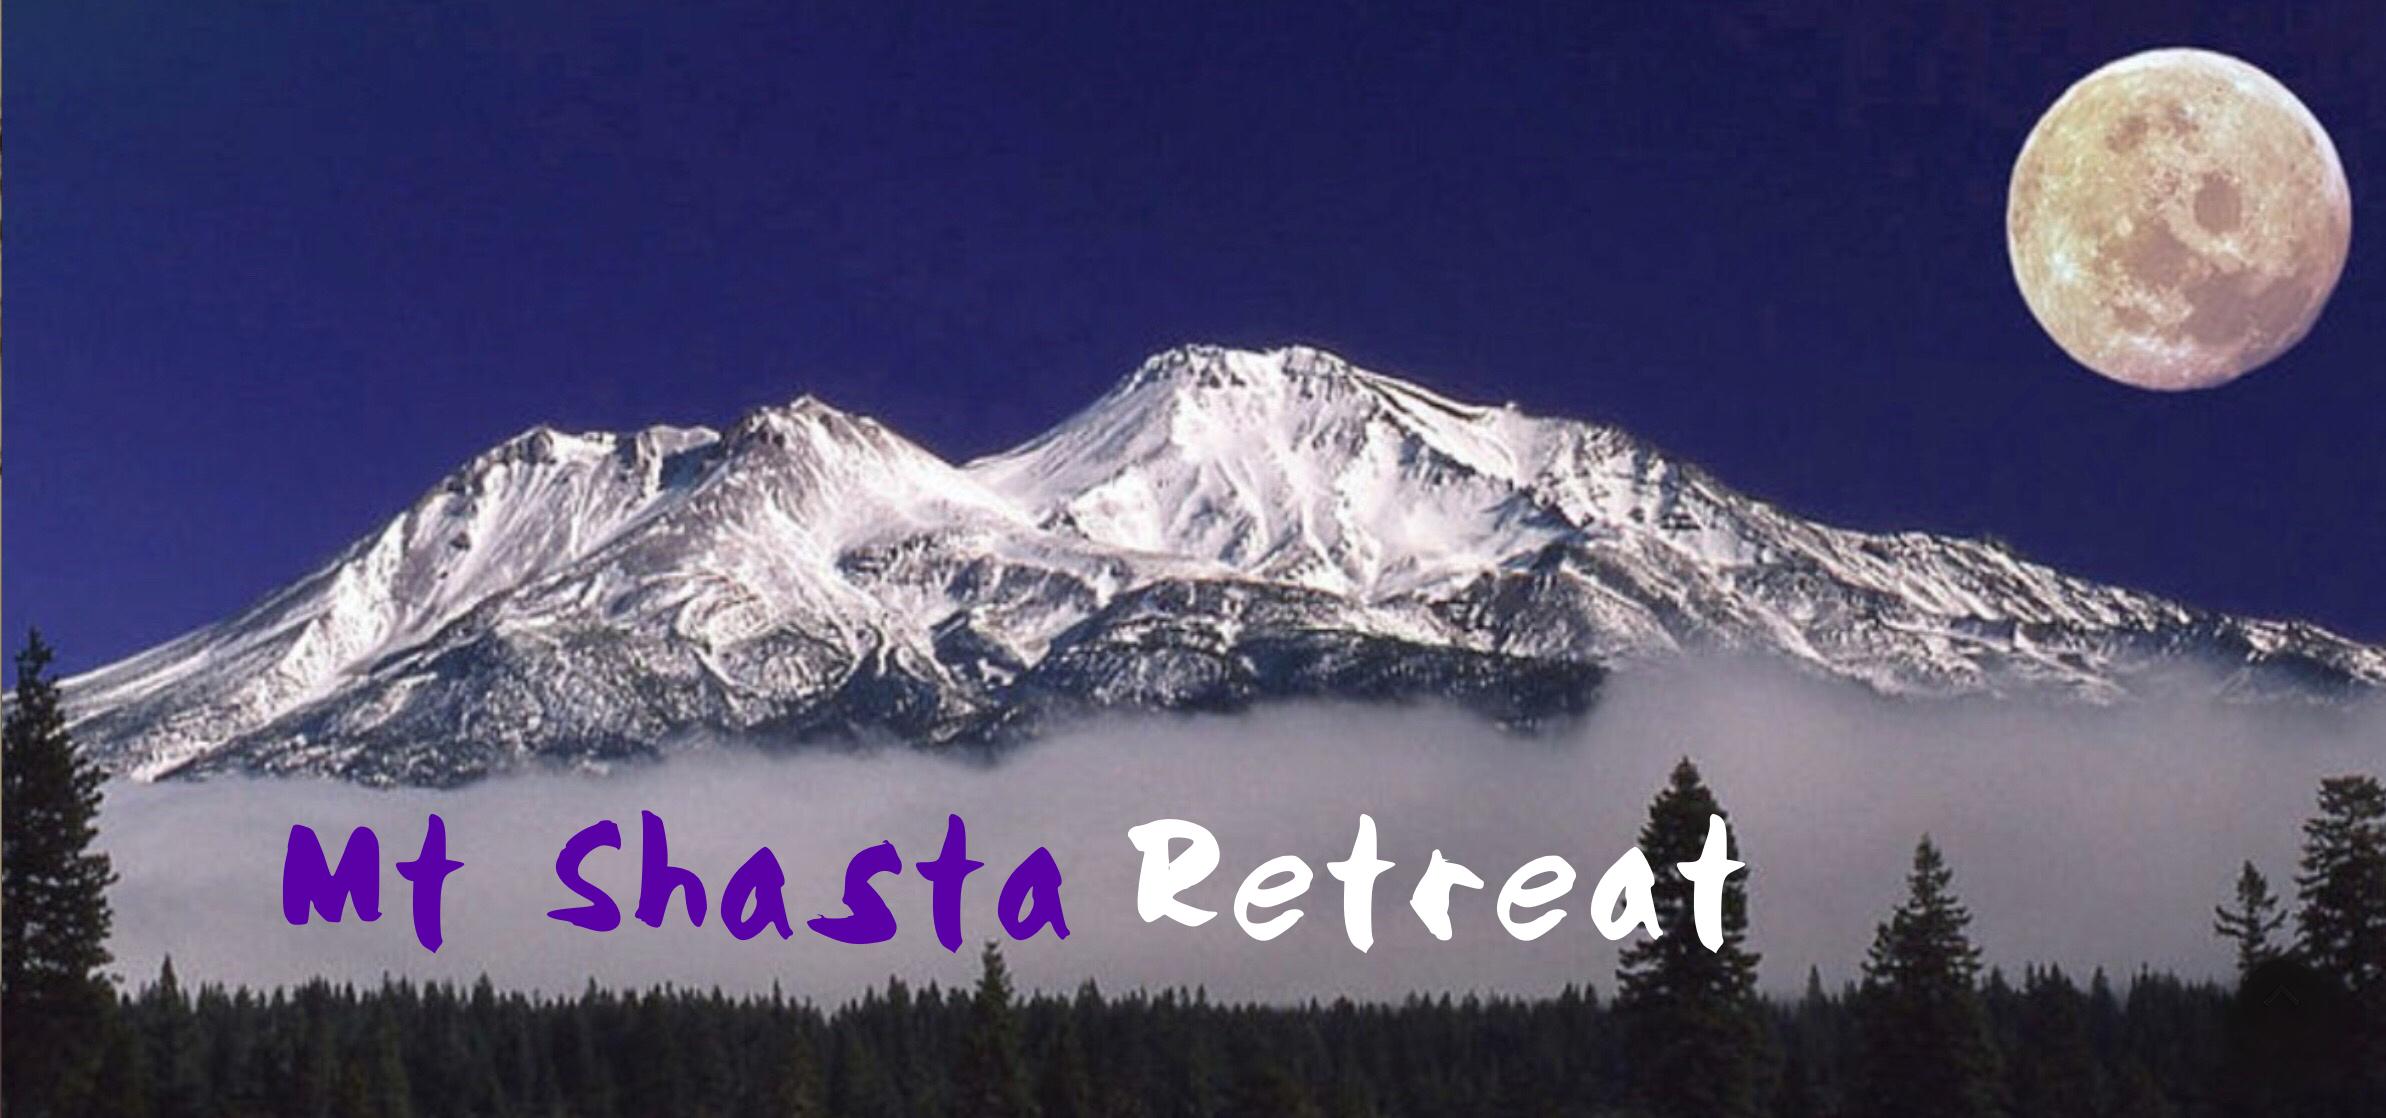 Mount Shasta Retreat